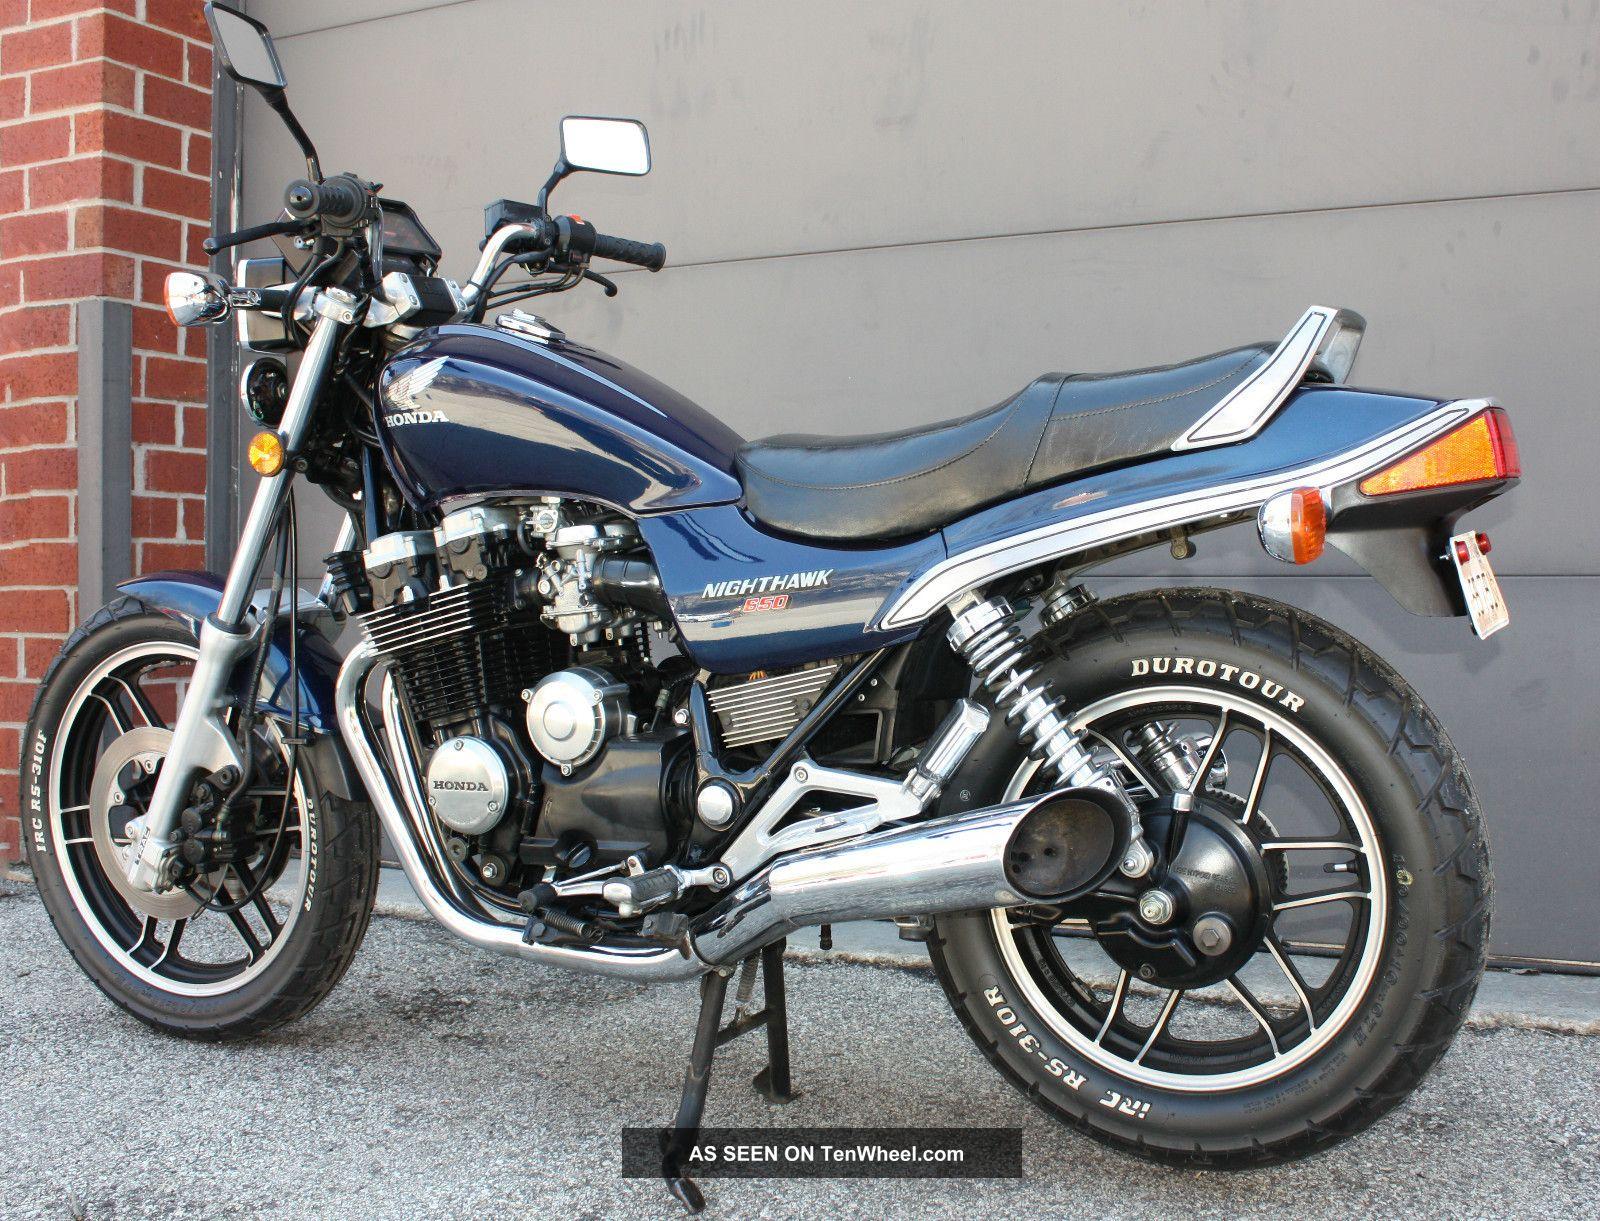 Cb Sc in addition Hqdefault besides Img Te Jzkj L Lsss R furthermore Honda Nighthawk Cb Sc Lgw further Maxresdefault. on 1983 honda nighthawk 550